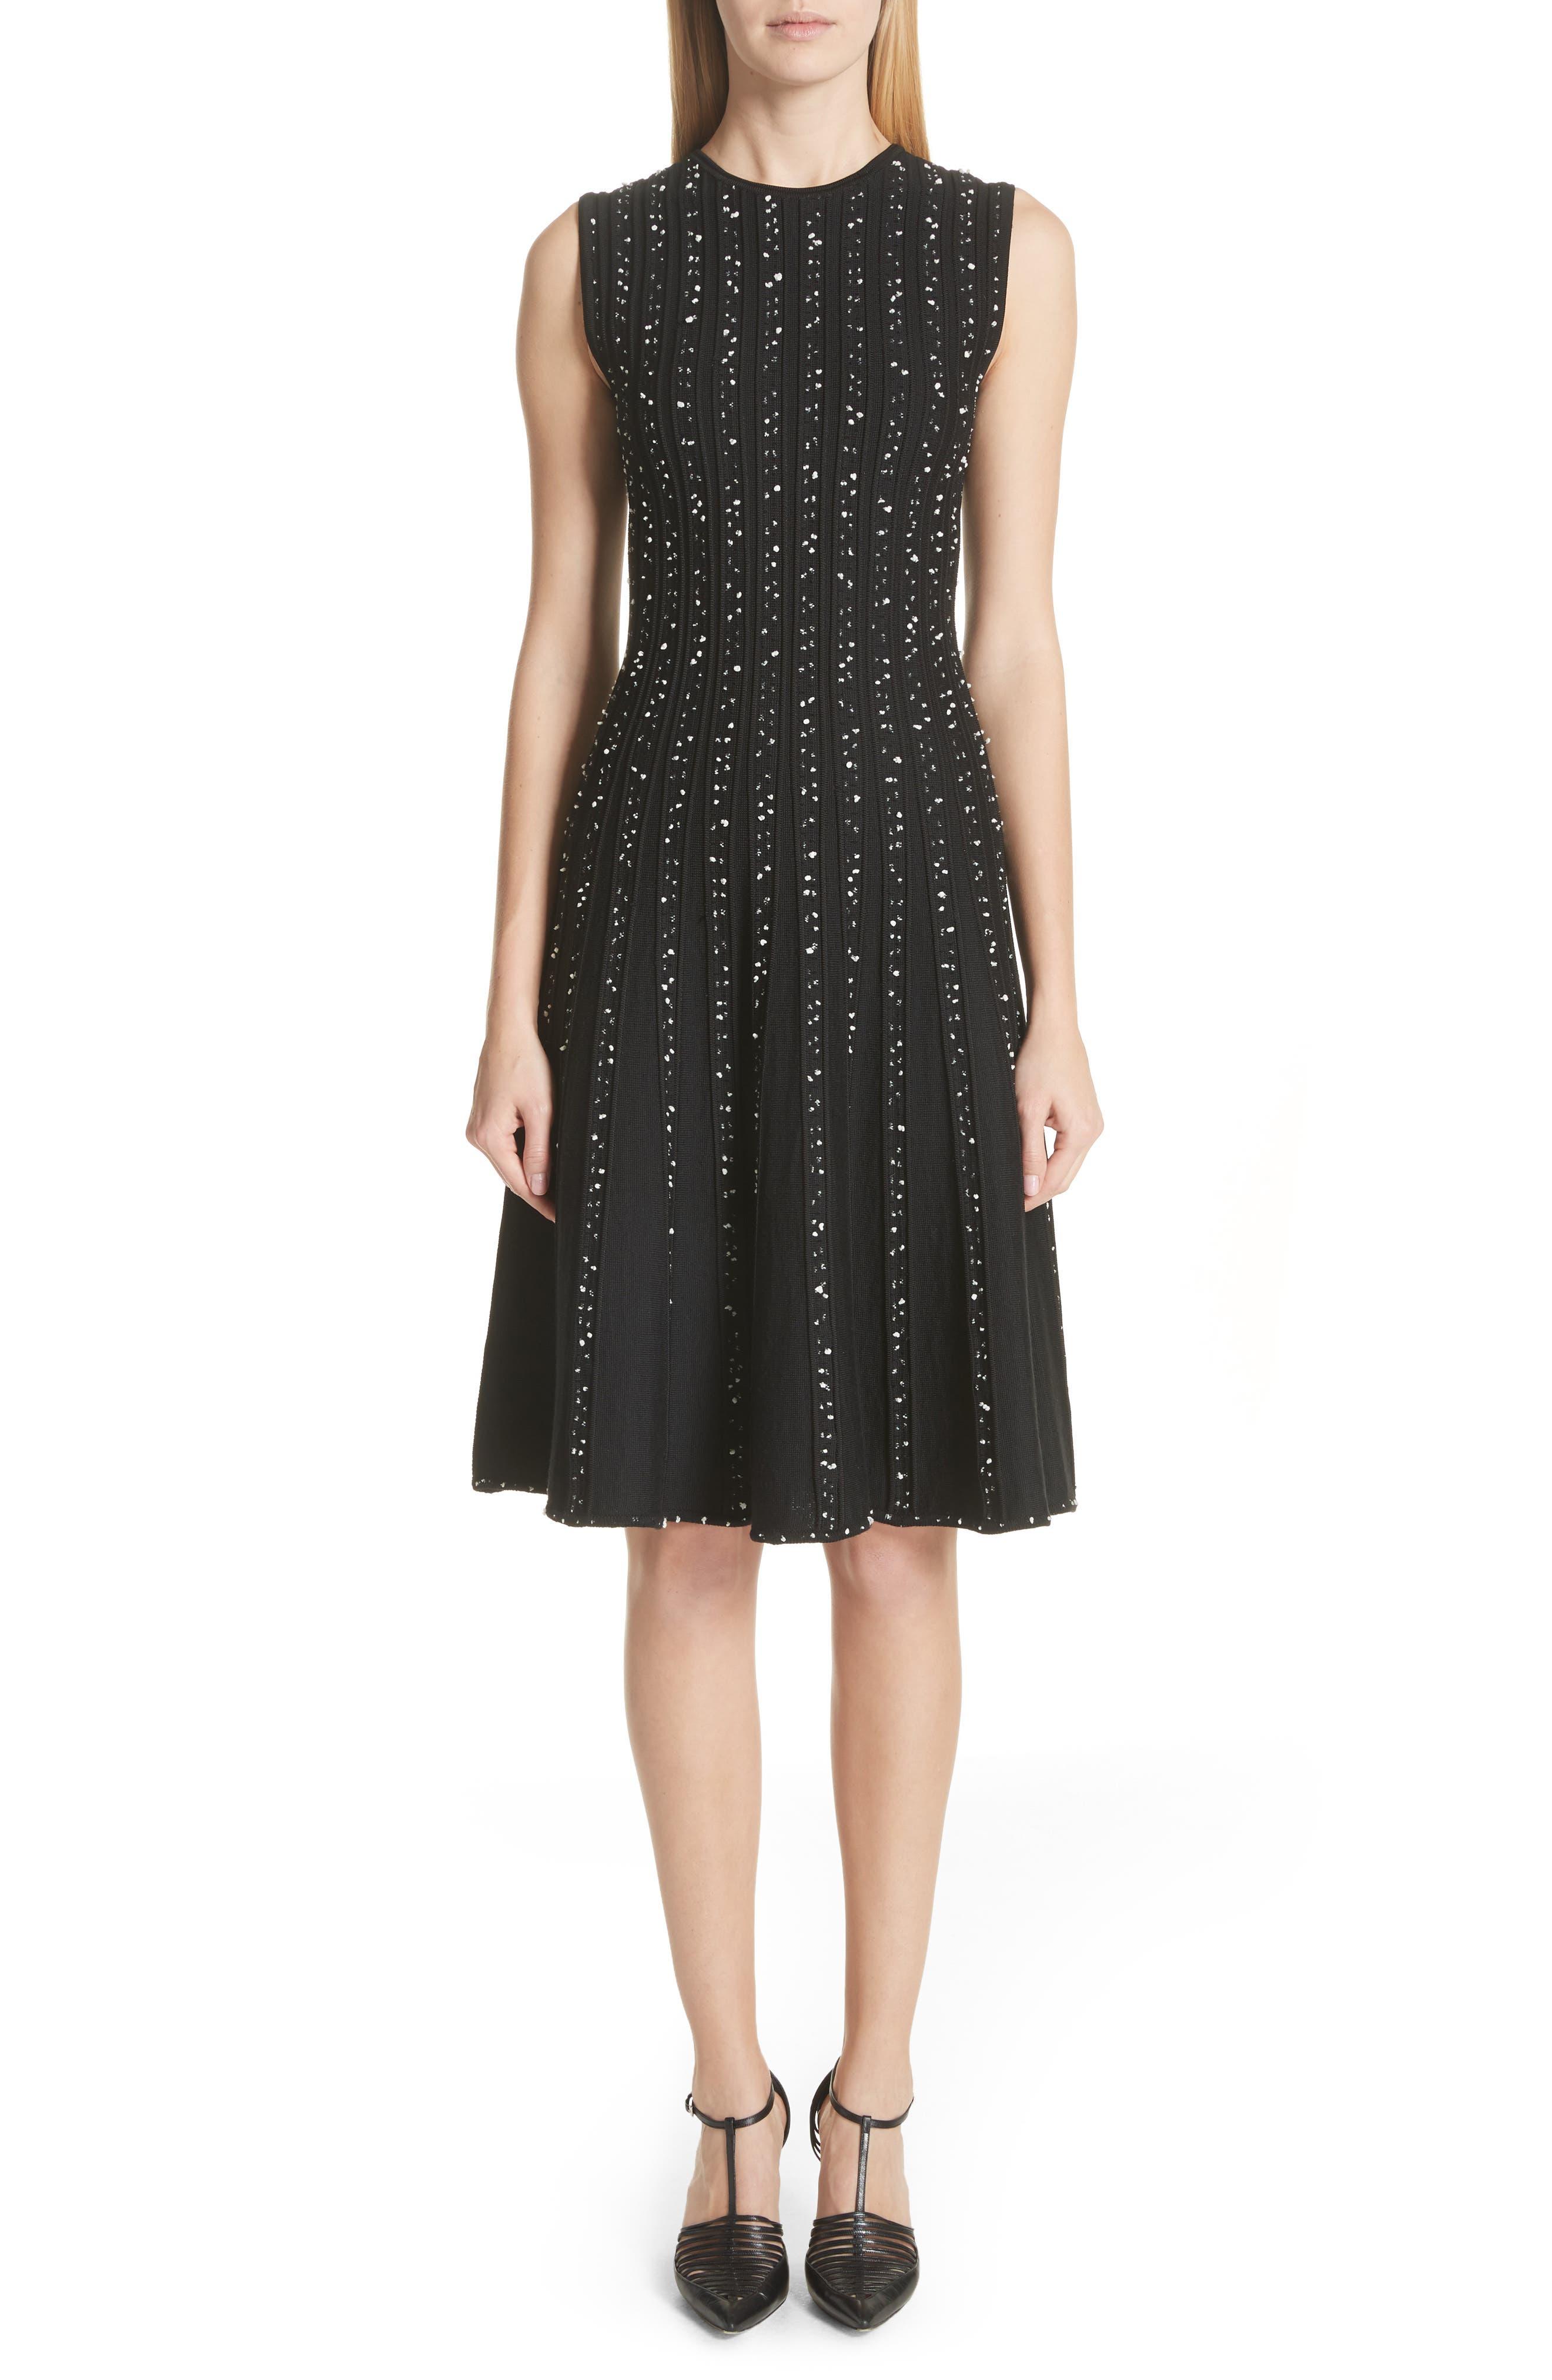 Alternate Image 1 Selected - Jason Wu Polka Dot Wool Blend Fit & Flare Dress